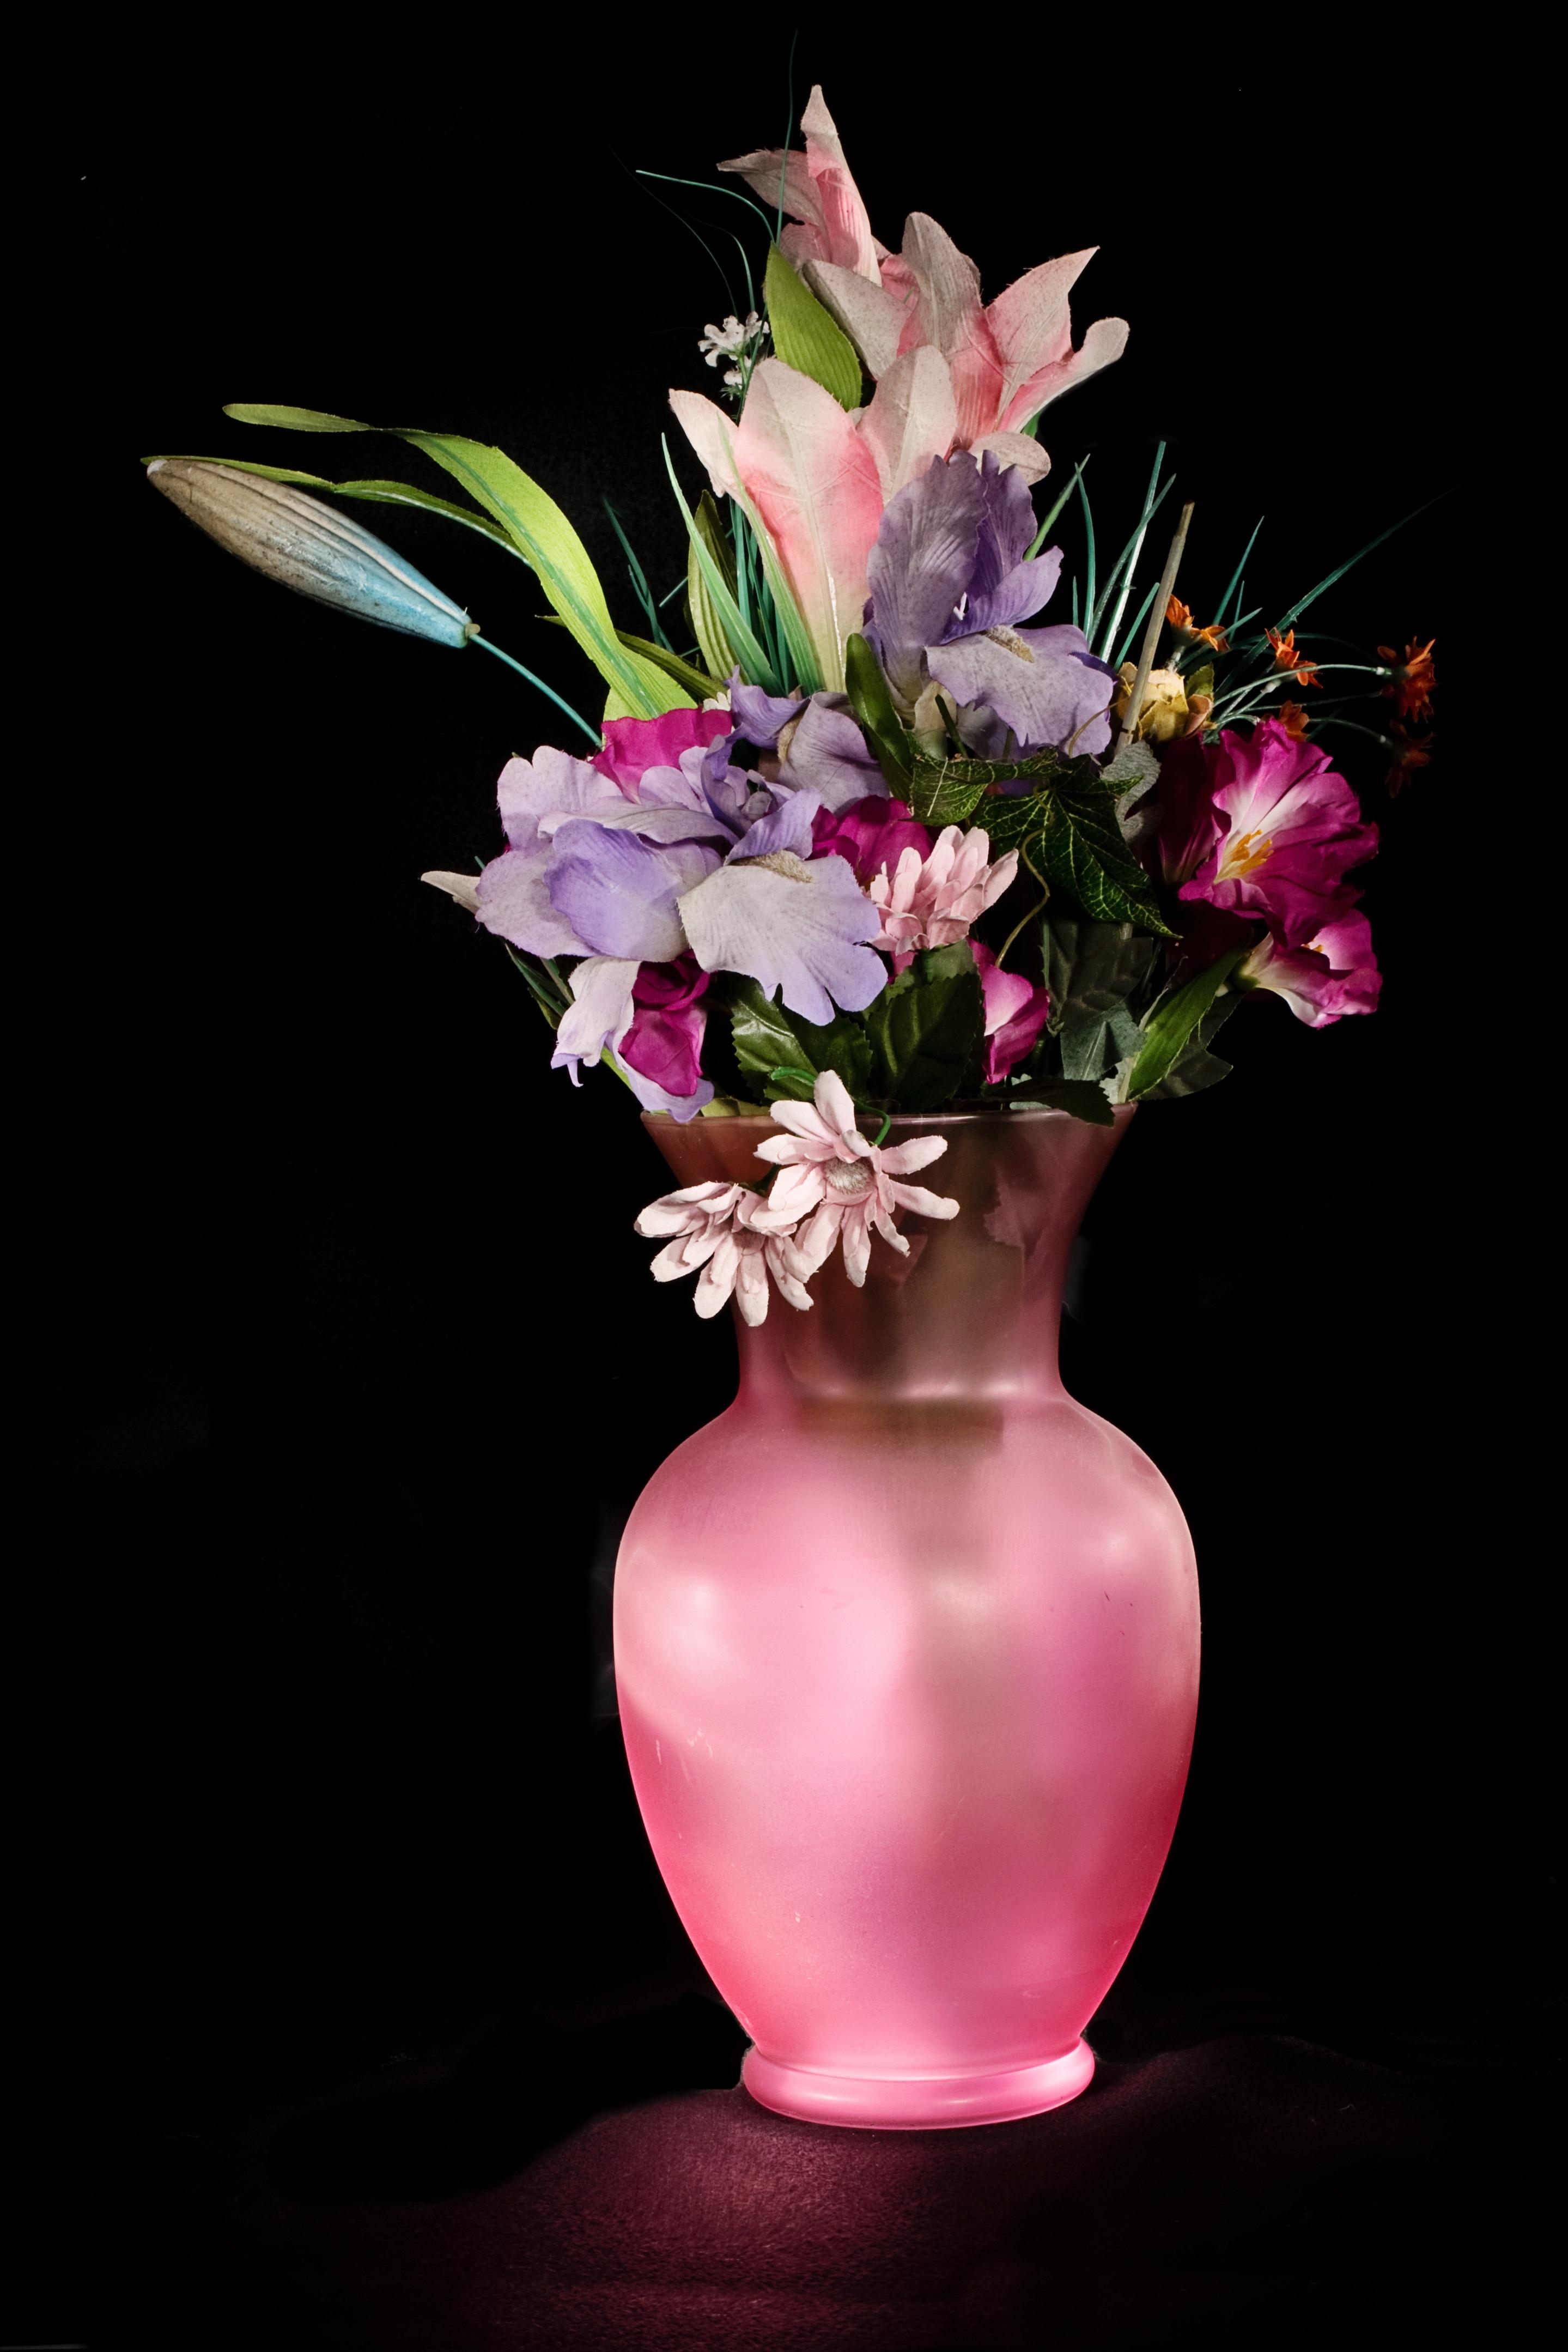 Pink Vase Free Stock Photo